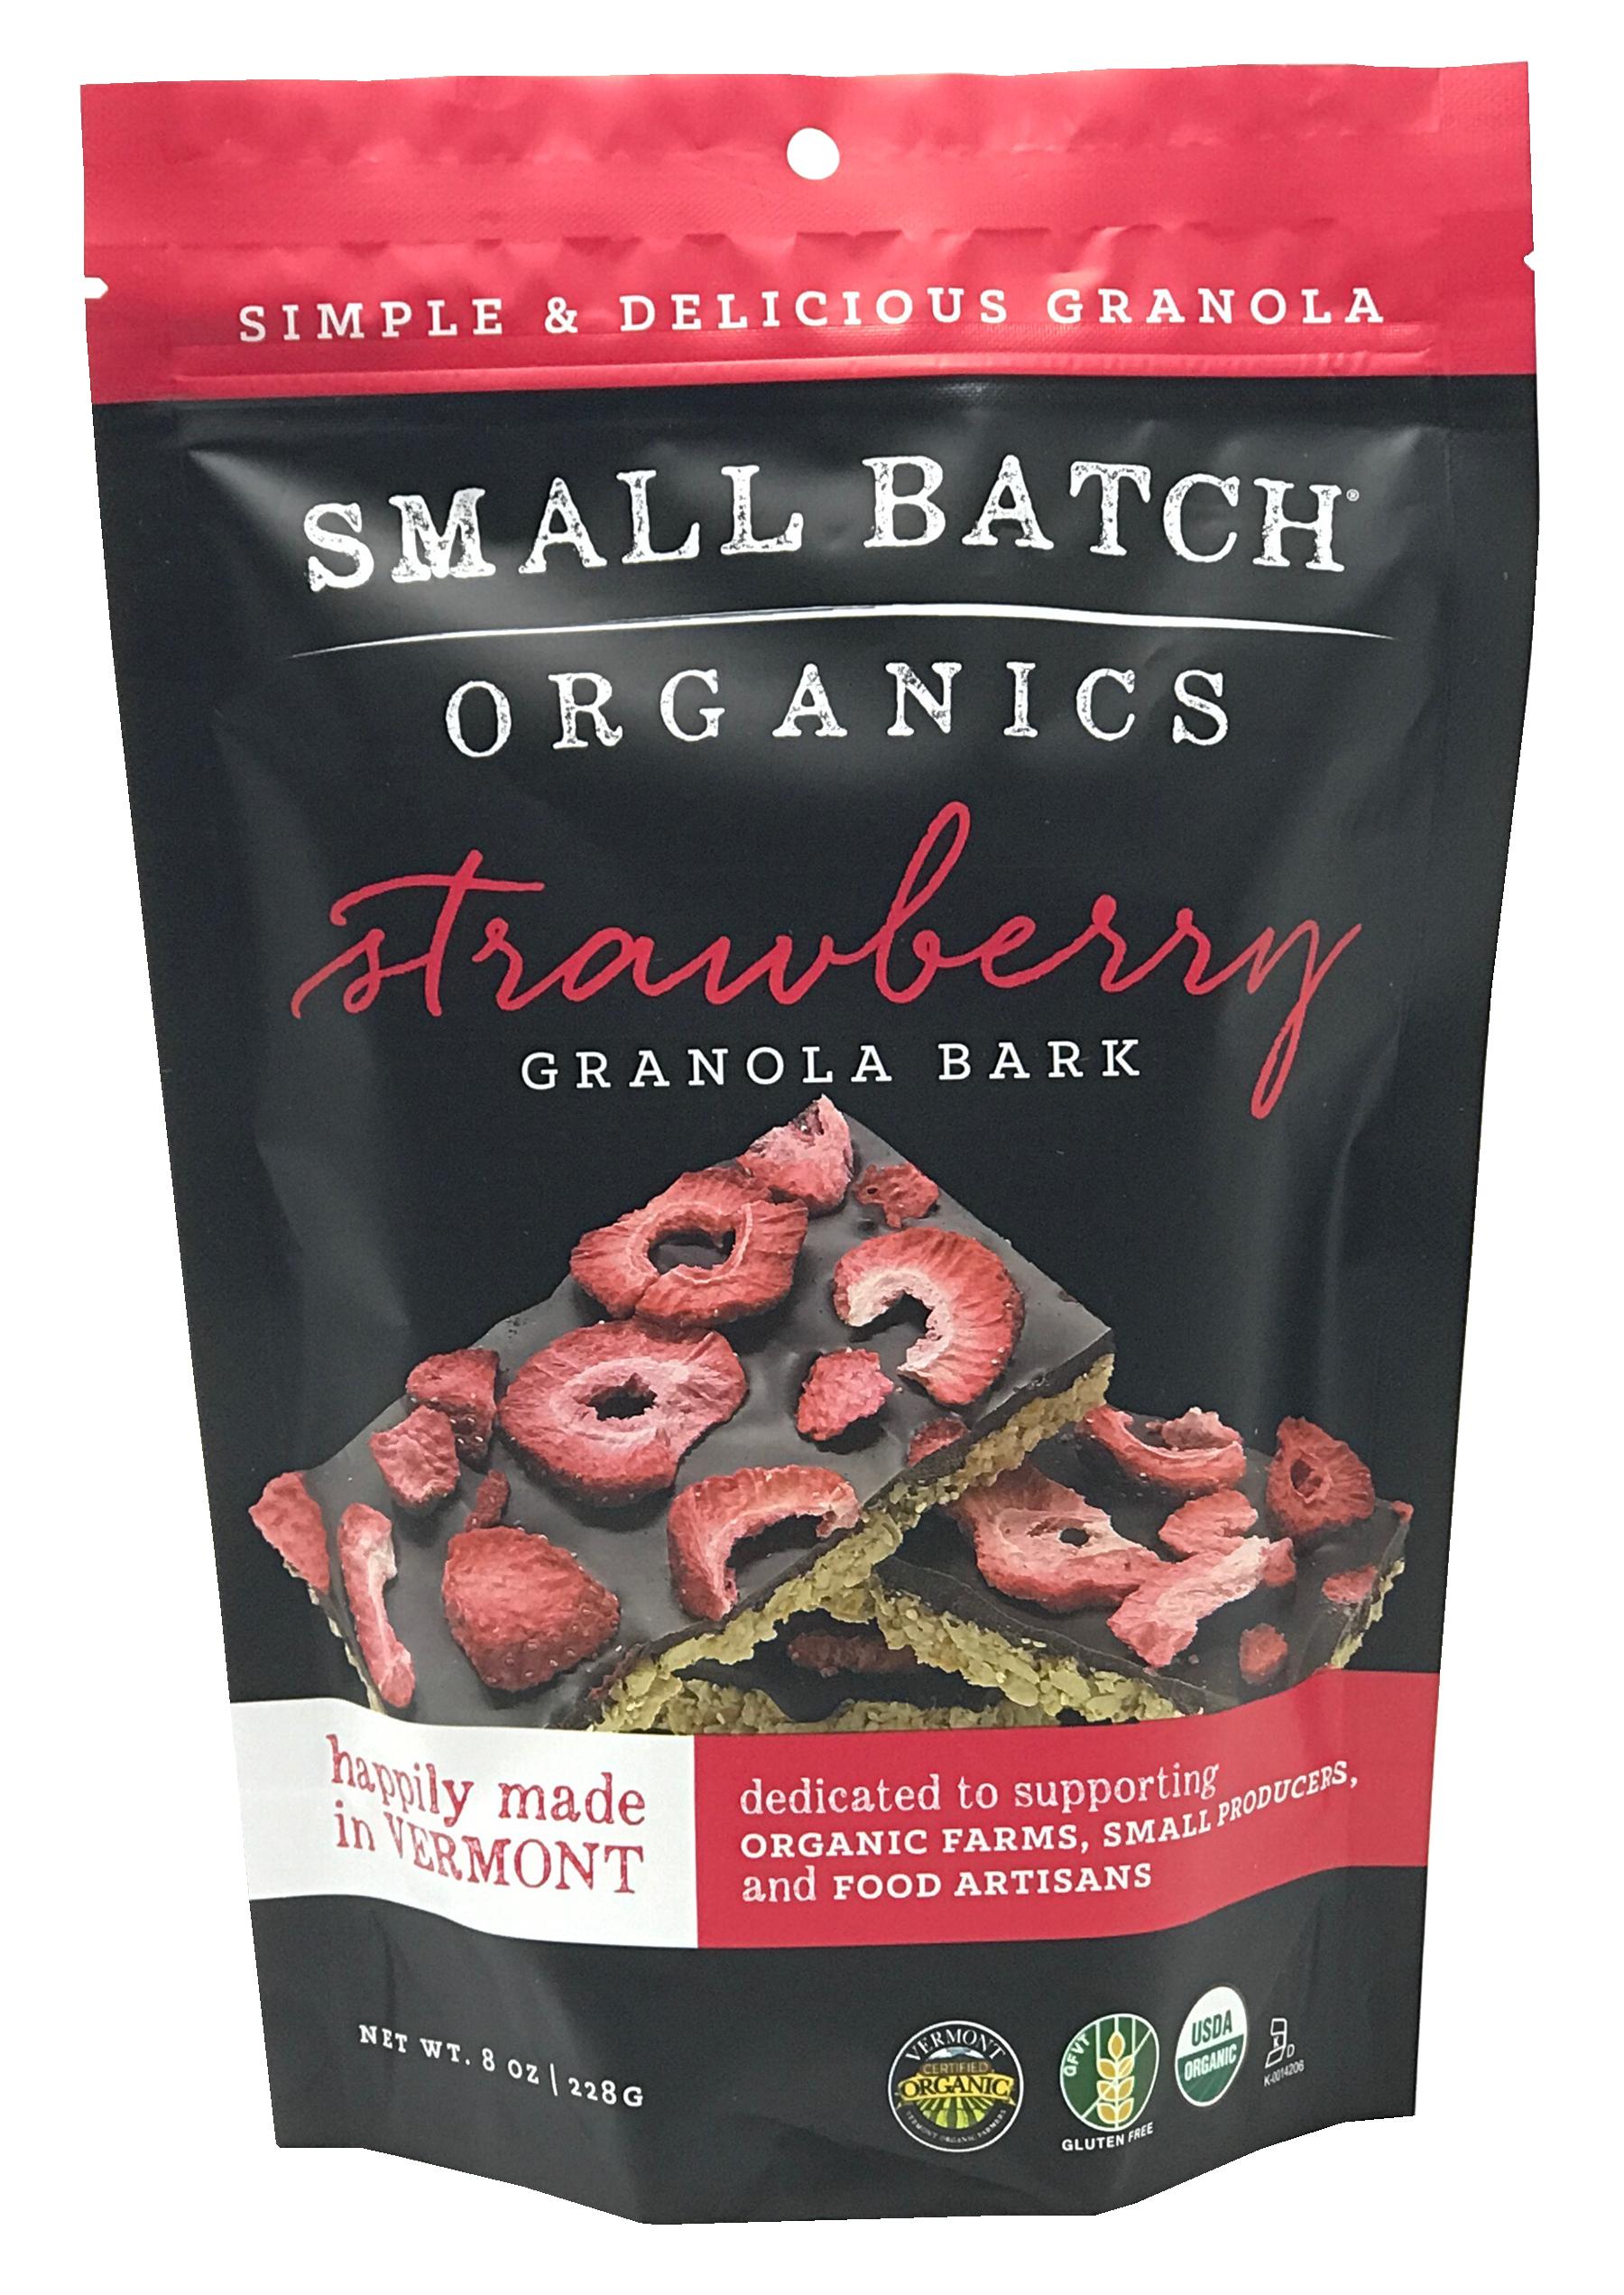 8oz Strawberry Granola Bark | Trada Marketplace